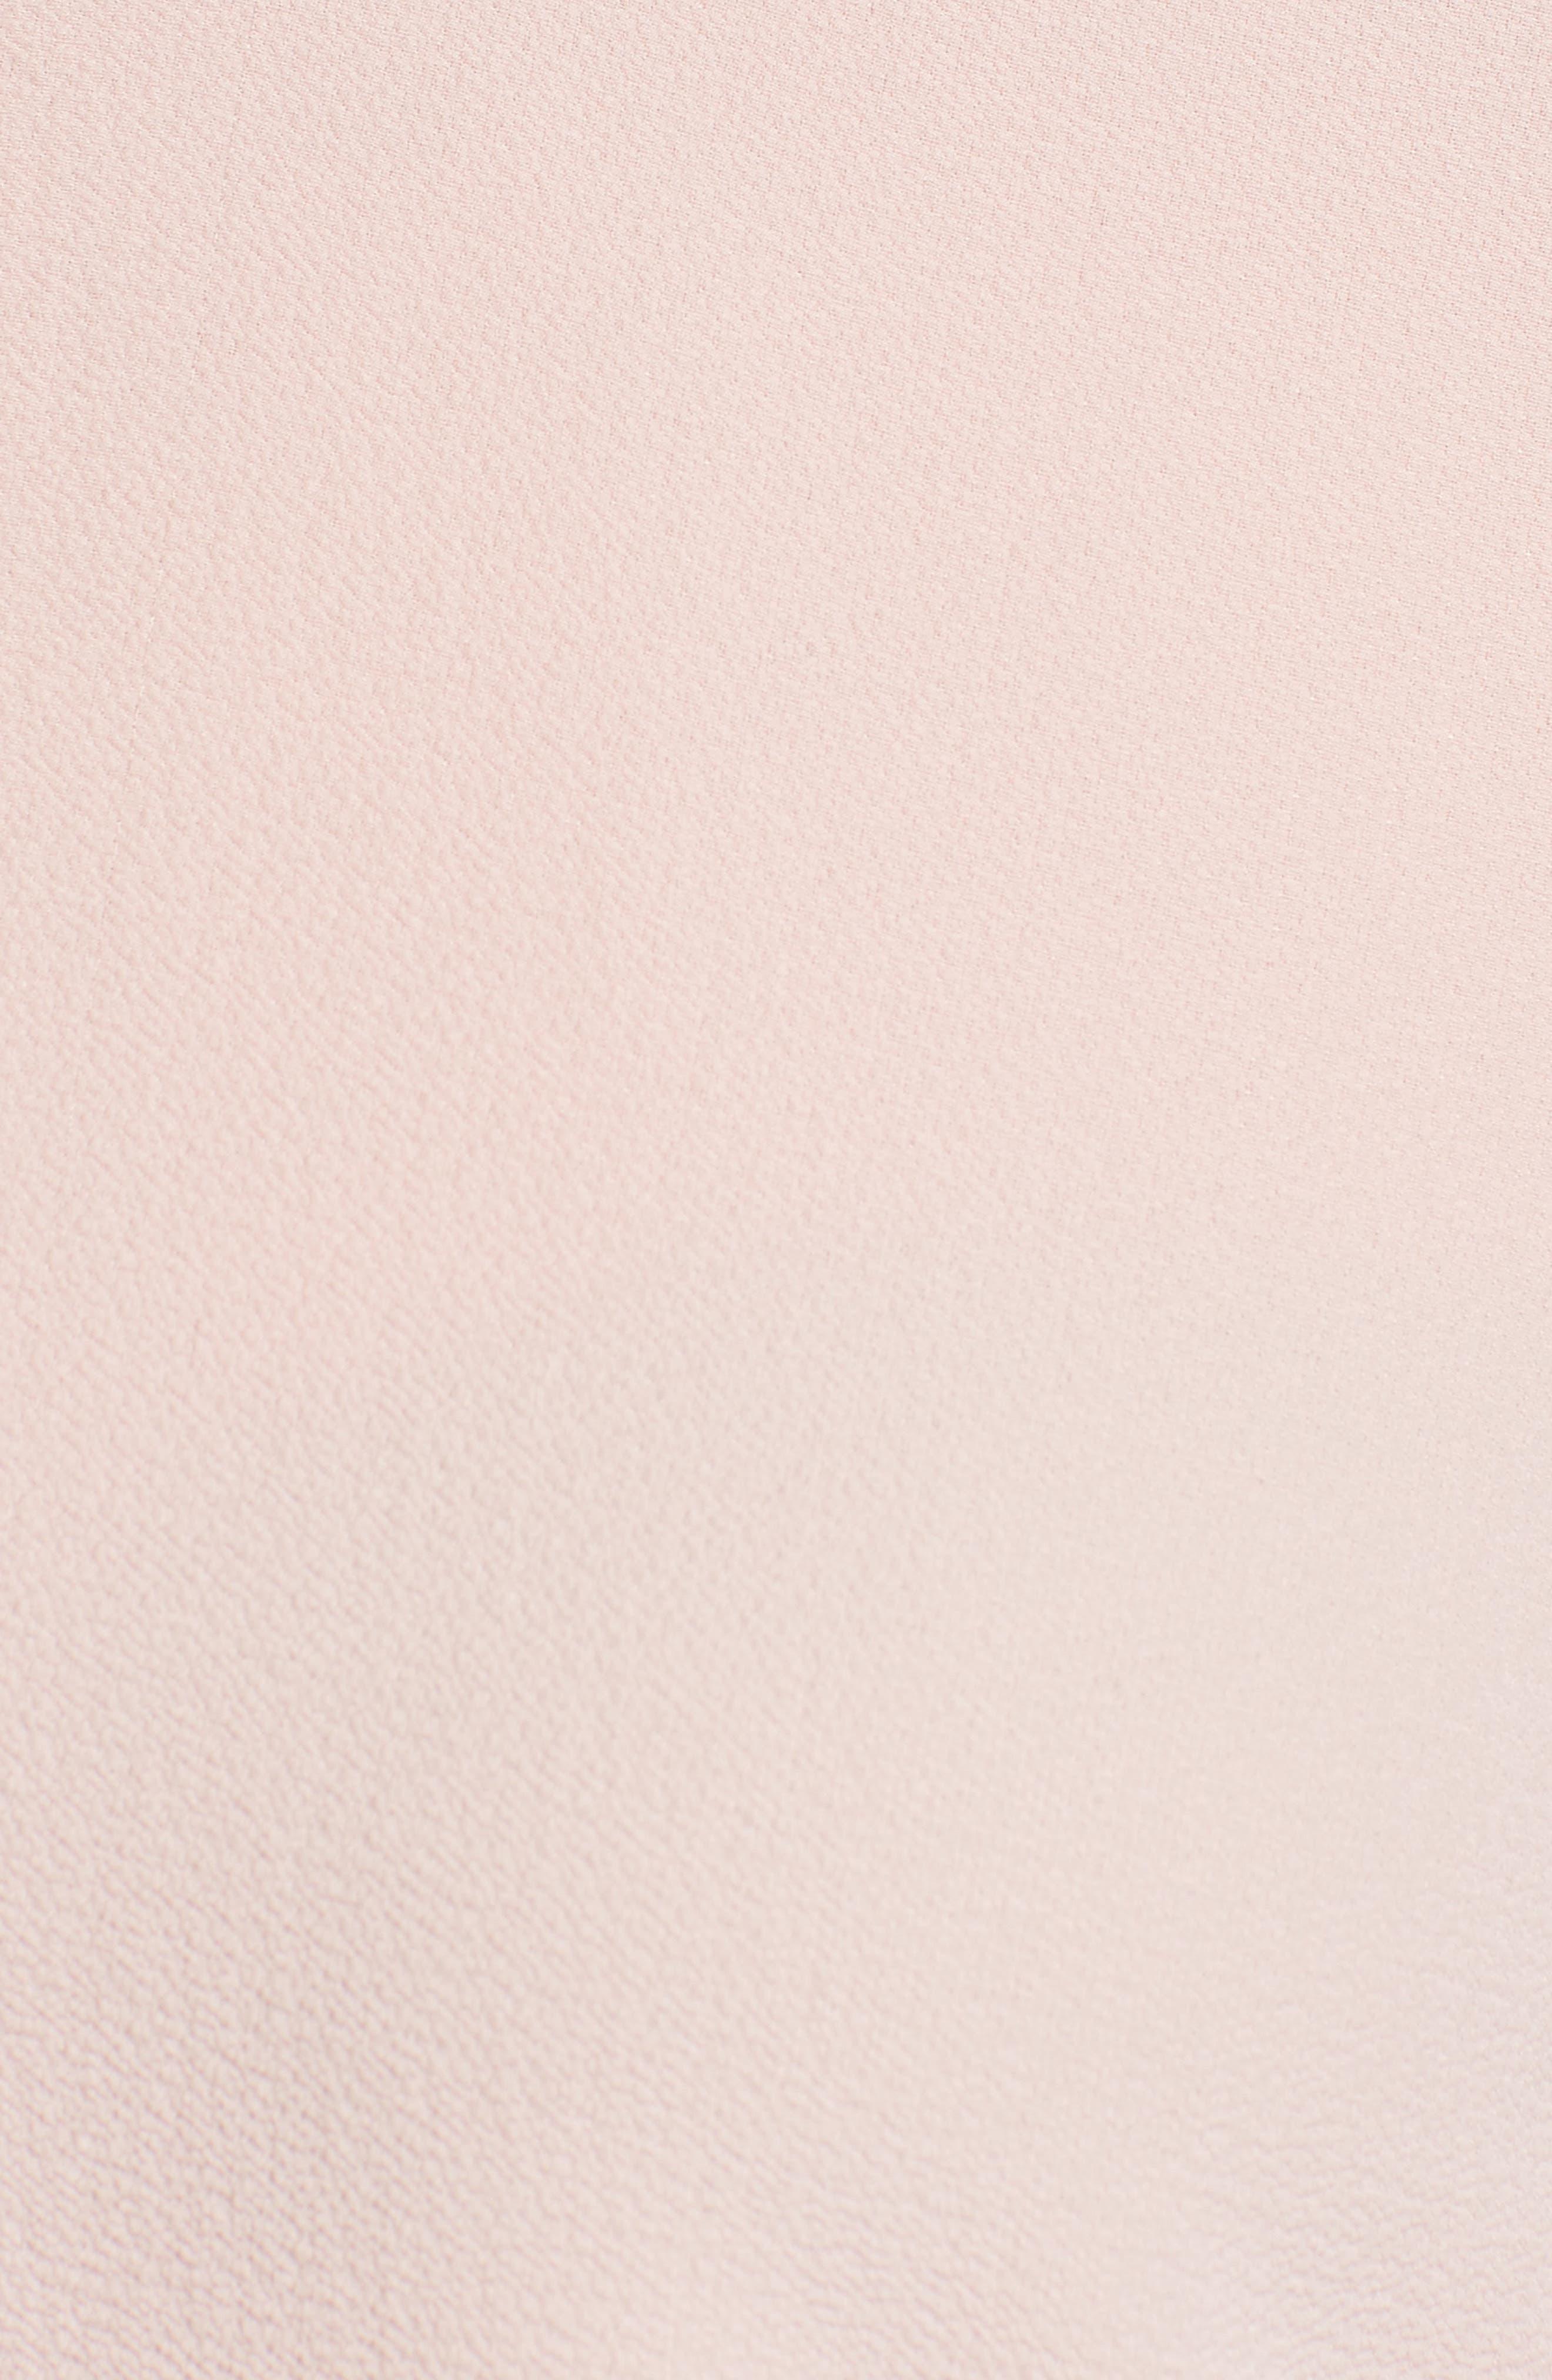 Bell Sleeve Blouse,                             Alternate thumbnail 5, color,                             Taffy Twist